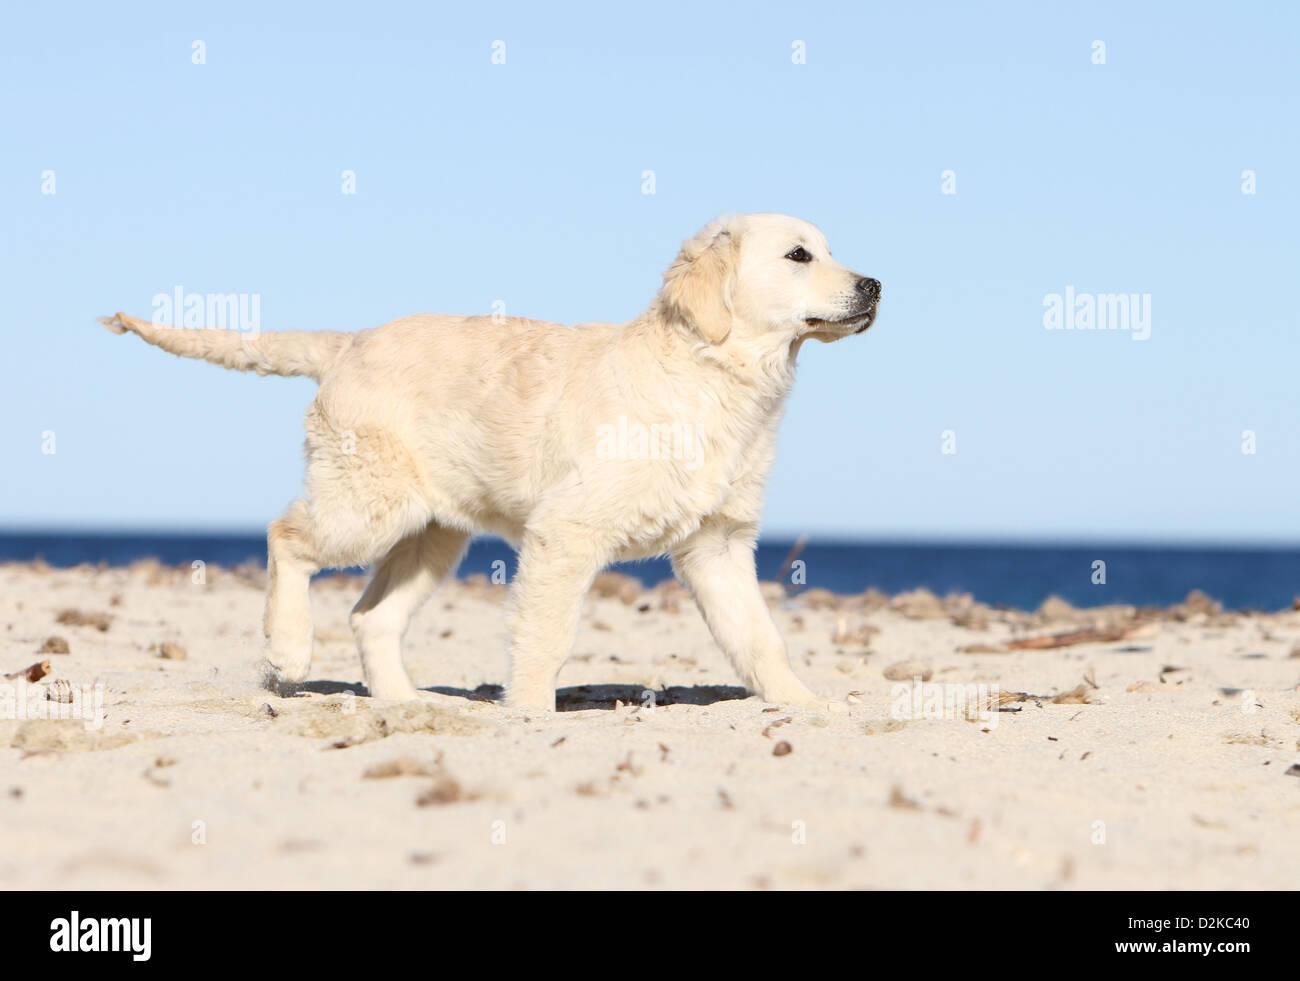 Dog Golden Retriever Puppy Walking On The Beach Stock Photo Alamy